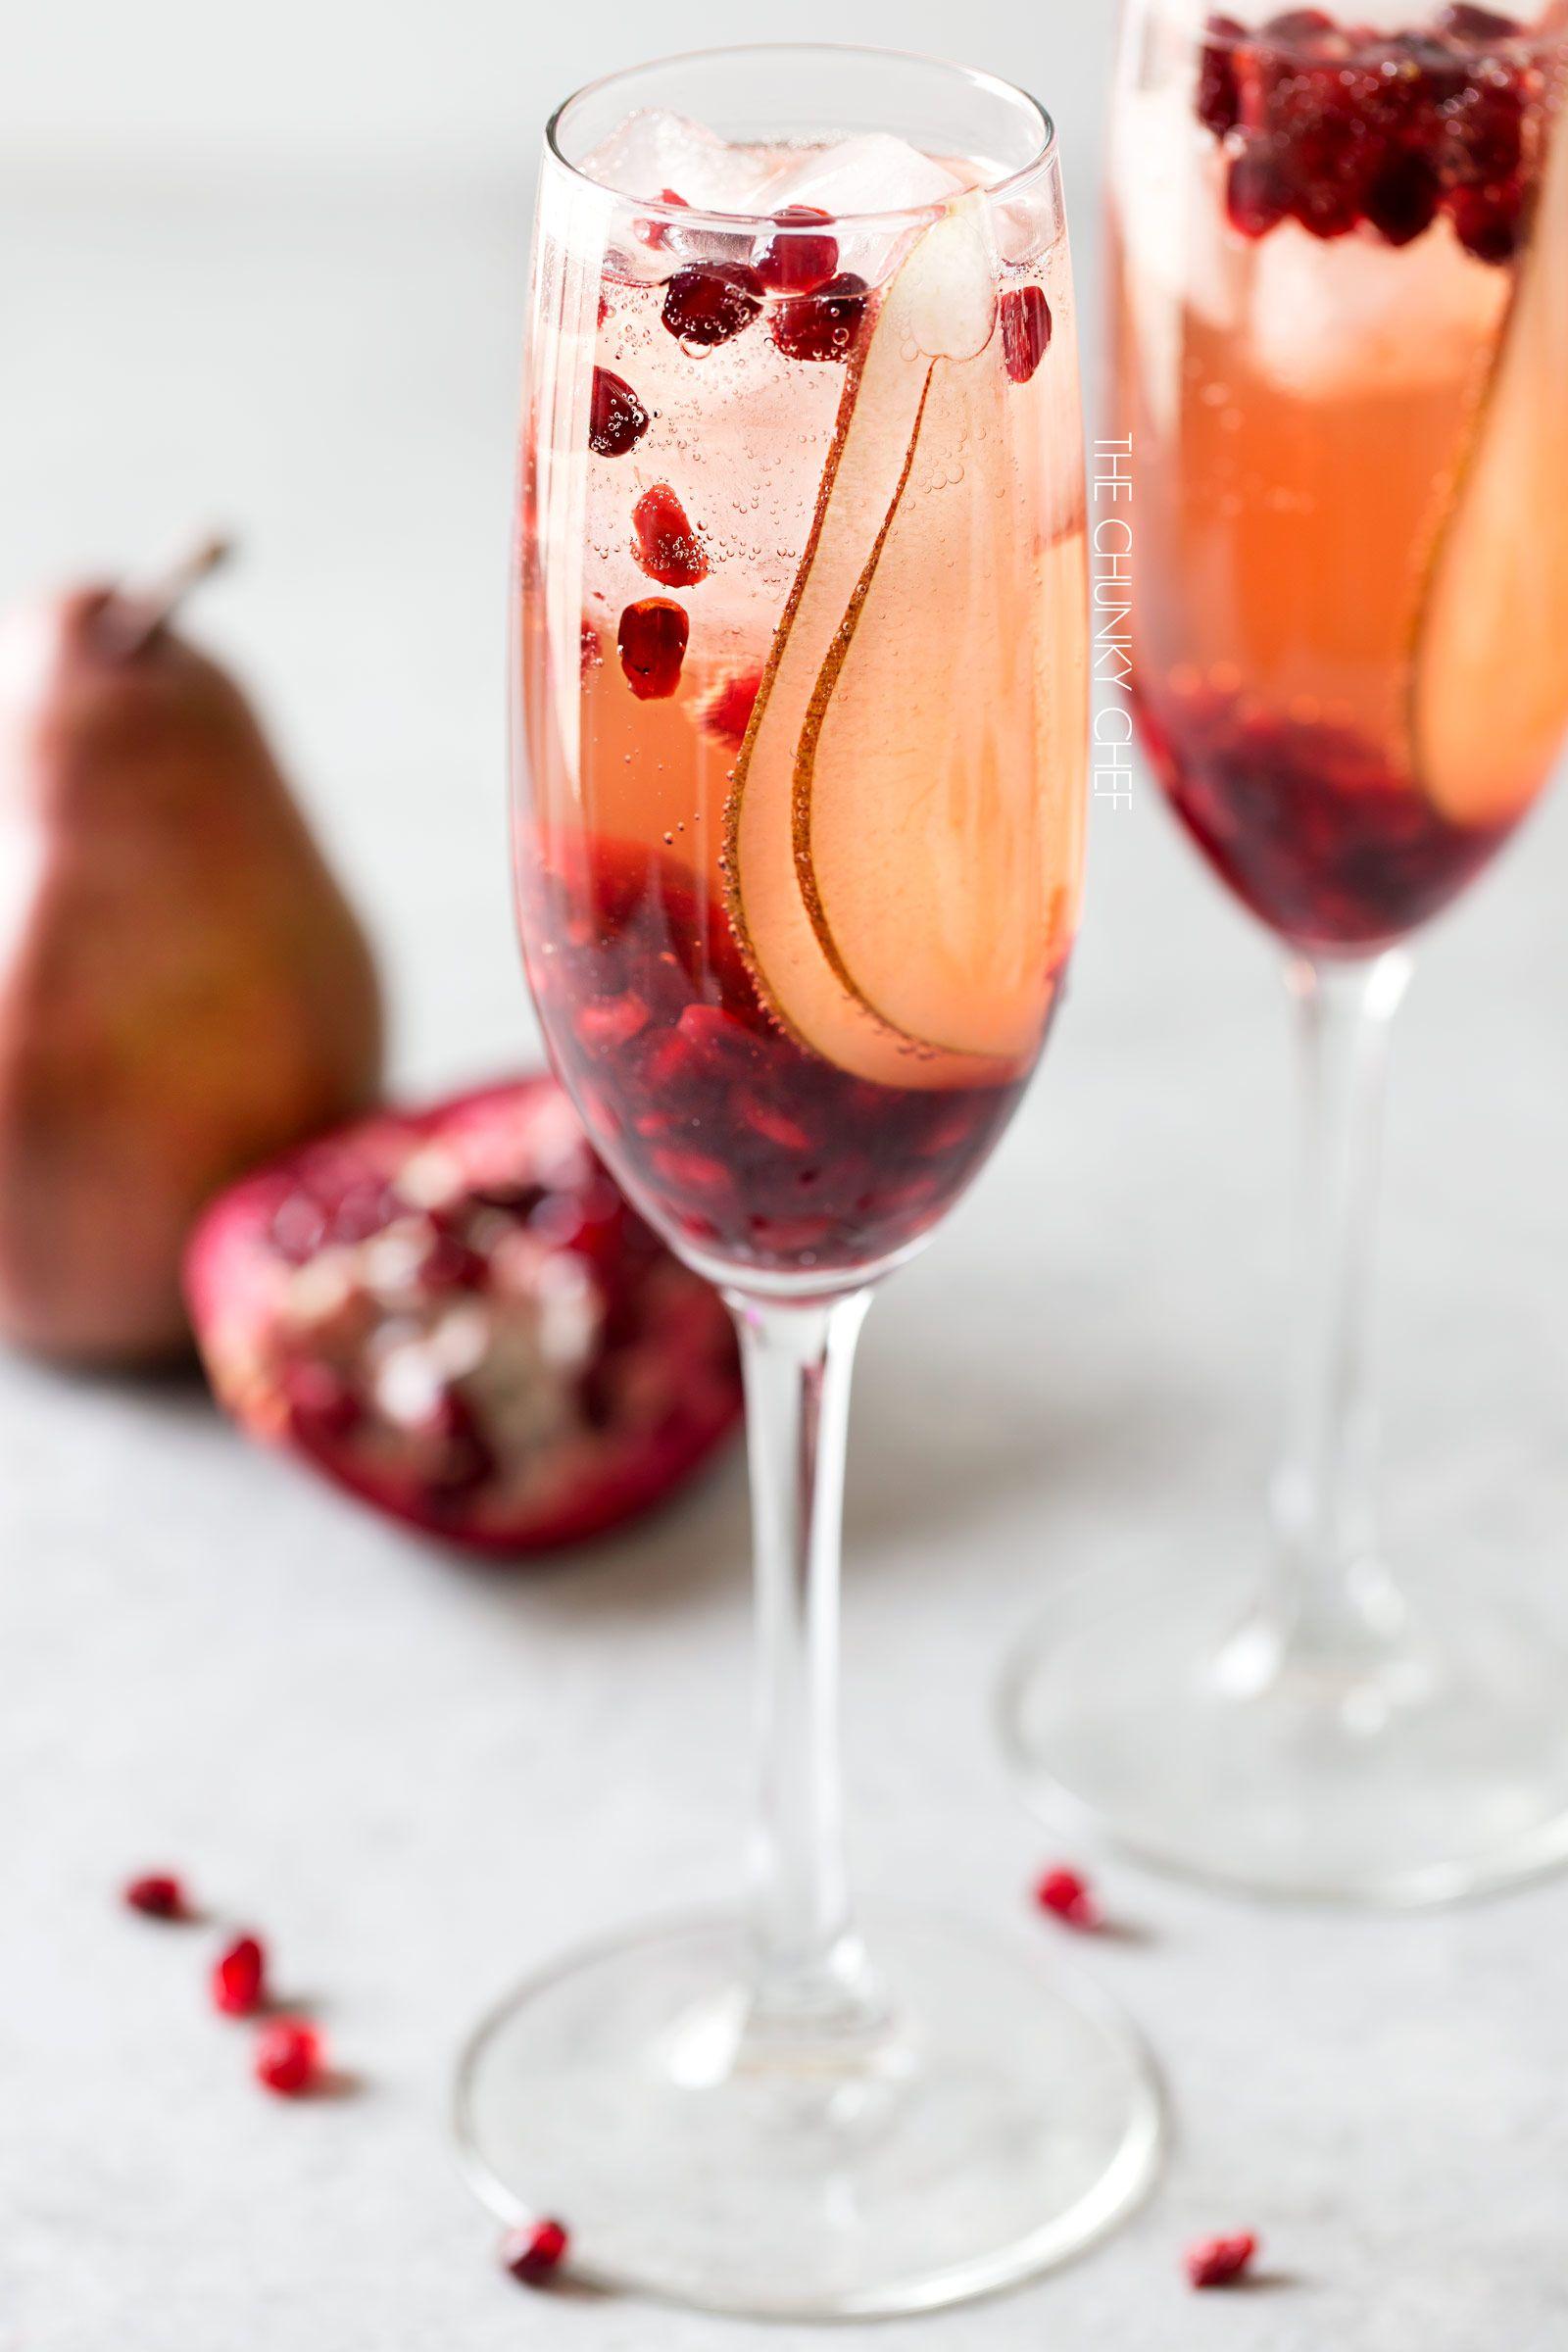 Pear Pomegranate Bellini A Delightful Combination Of Prosecco And Pear Brandy Create This Light Bubbly And Elegant Oreo Milkshake Bars Recipes Bellini Bar